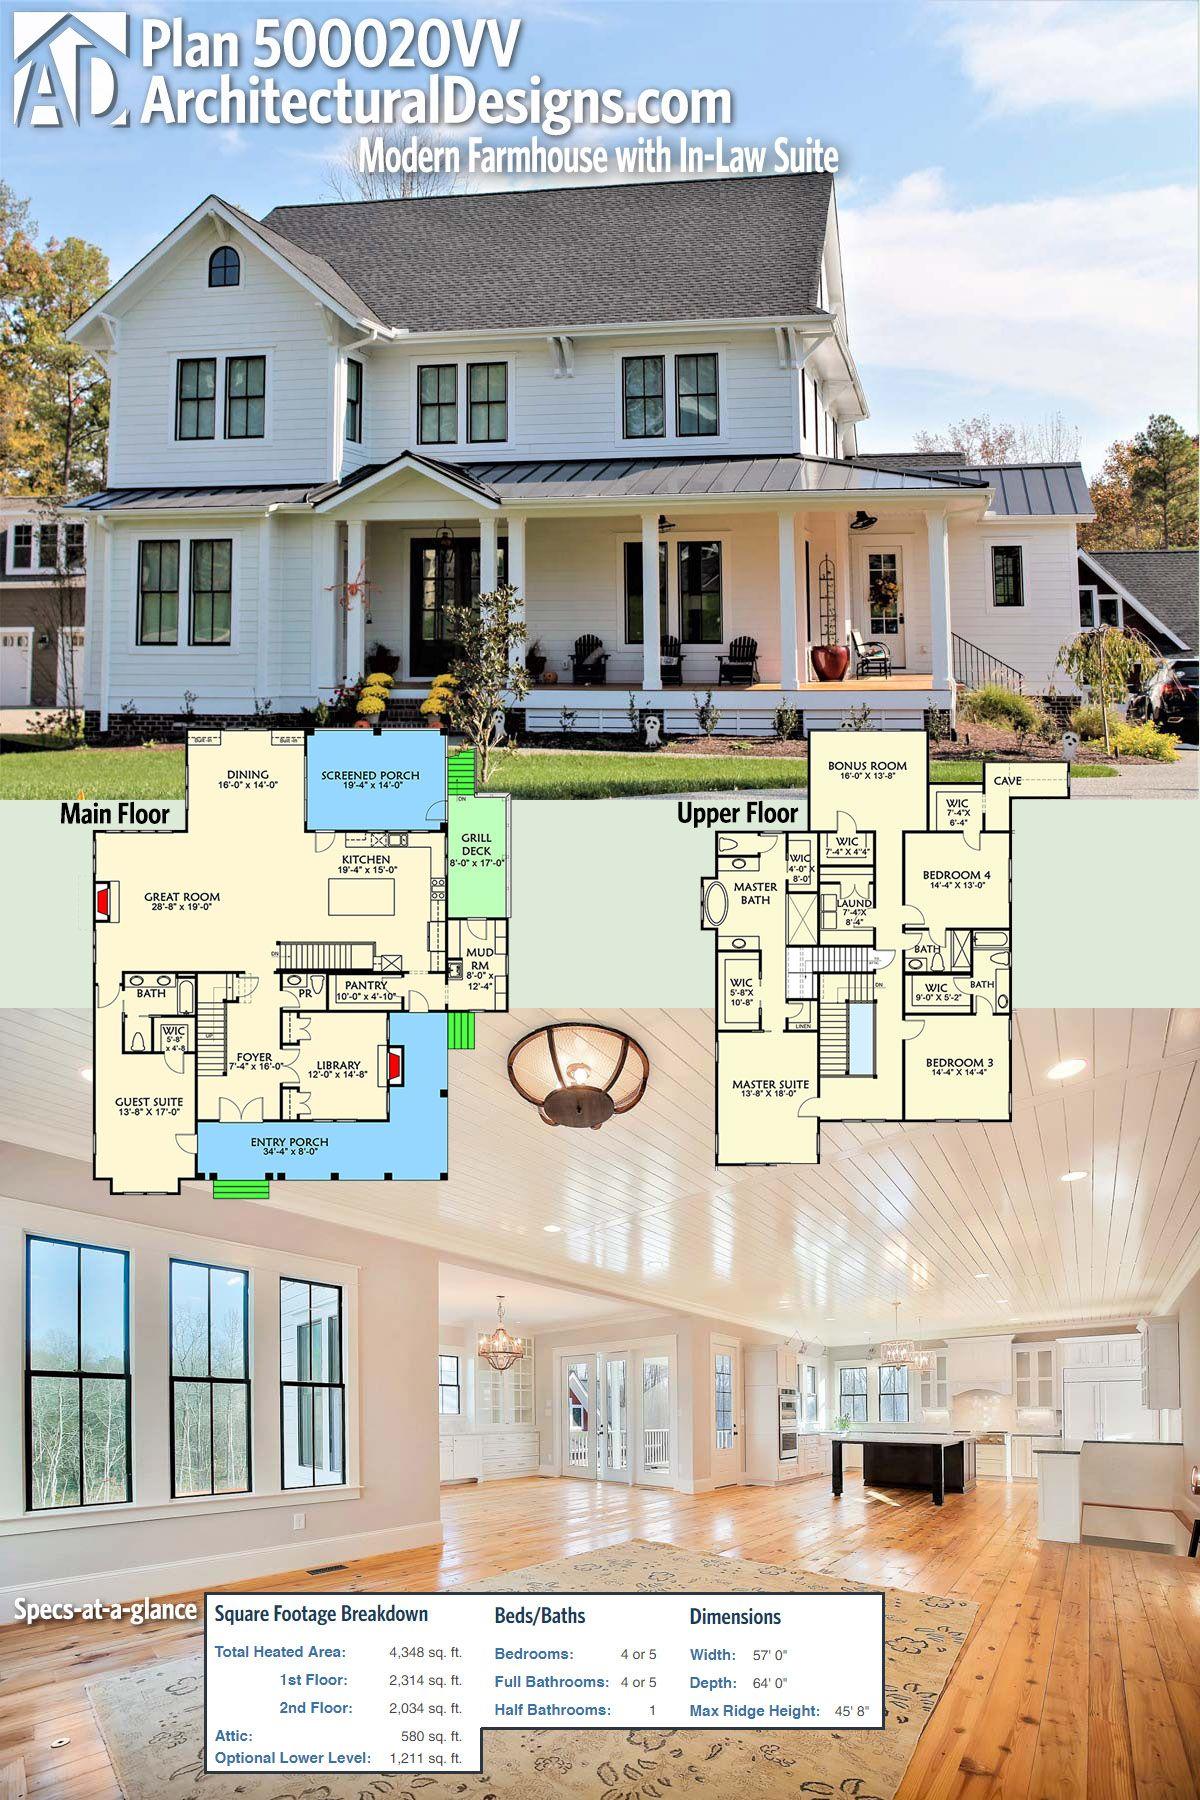 Architectural Designs Modern Farmhouse Plan 500020VV has